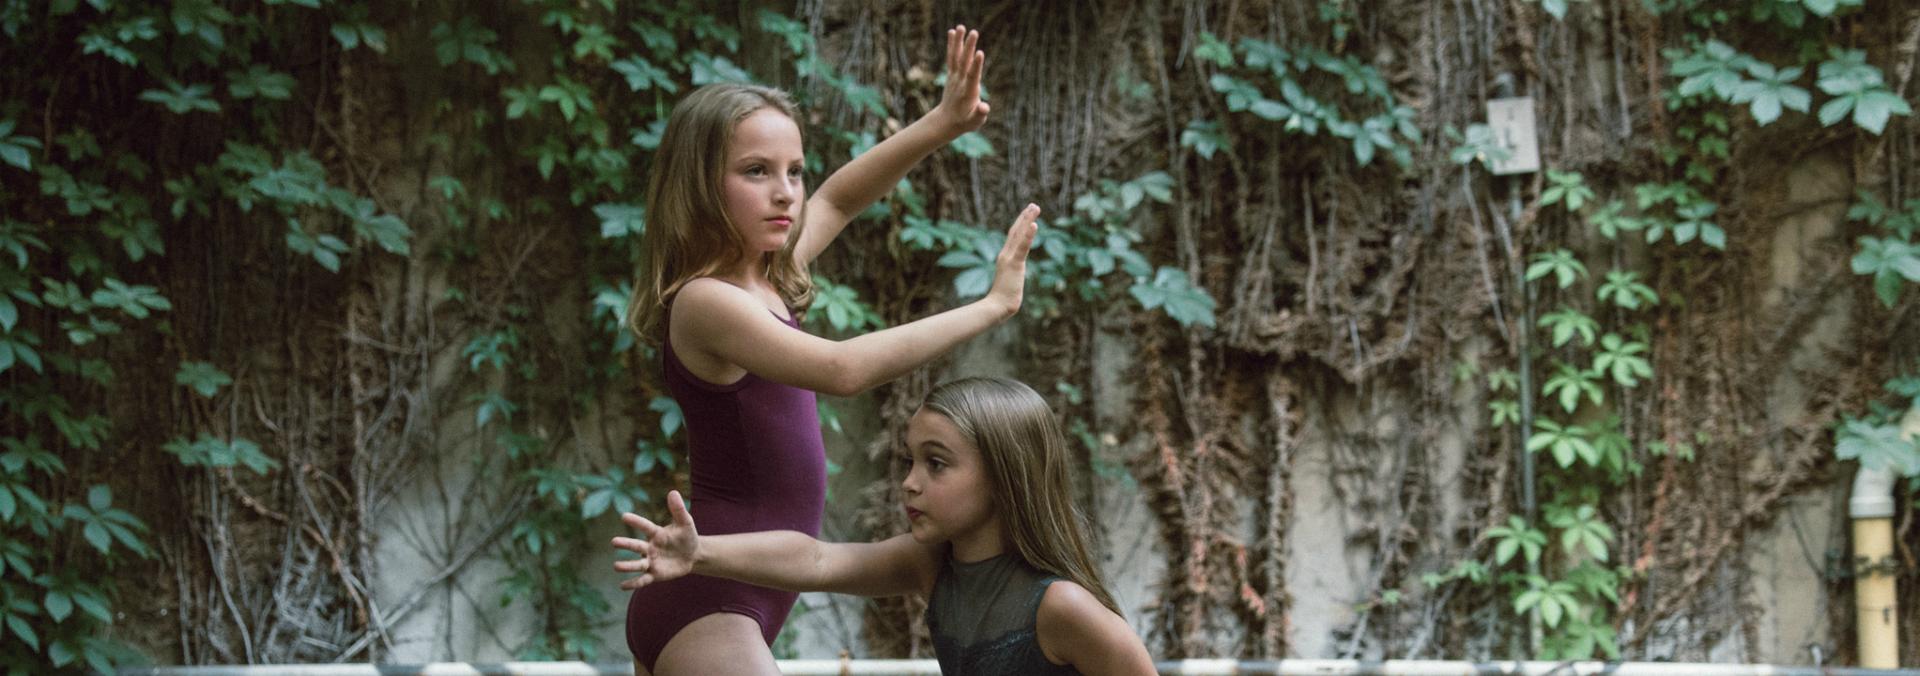 McKinney Dance Academy image 2